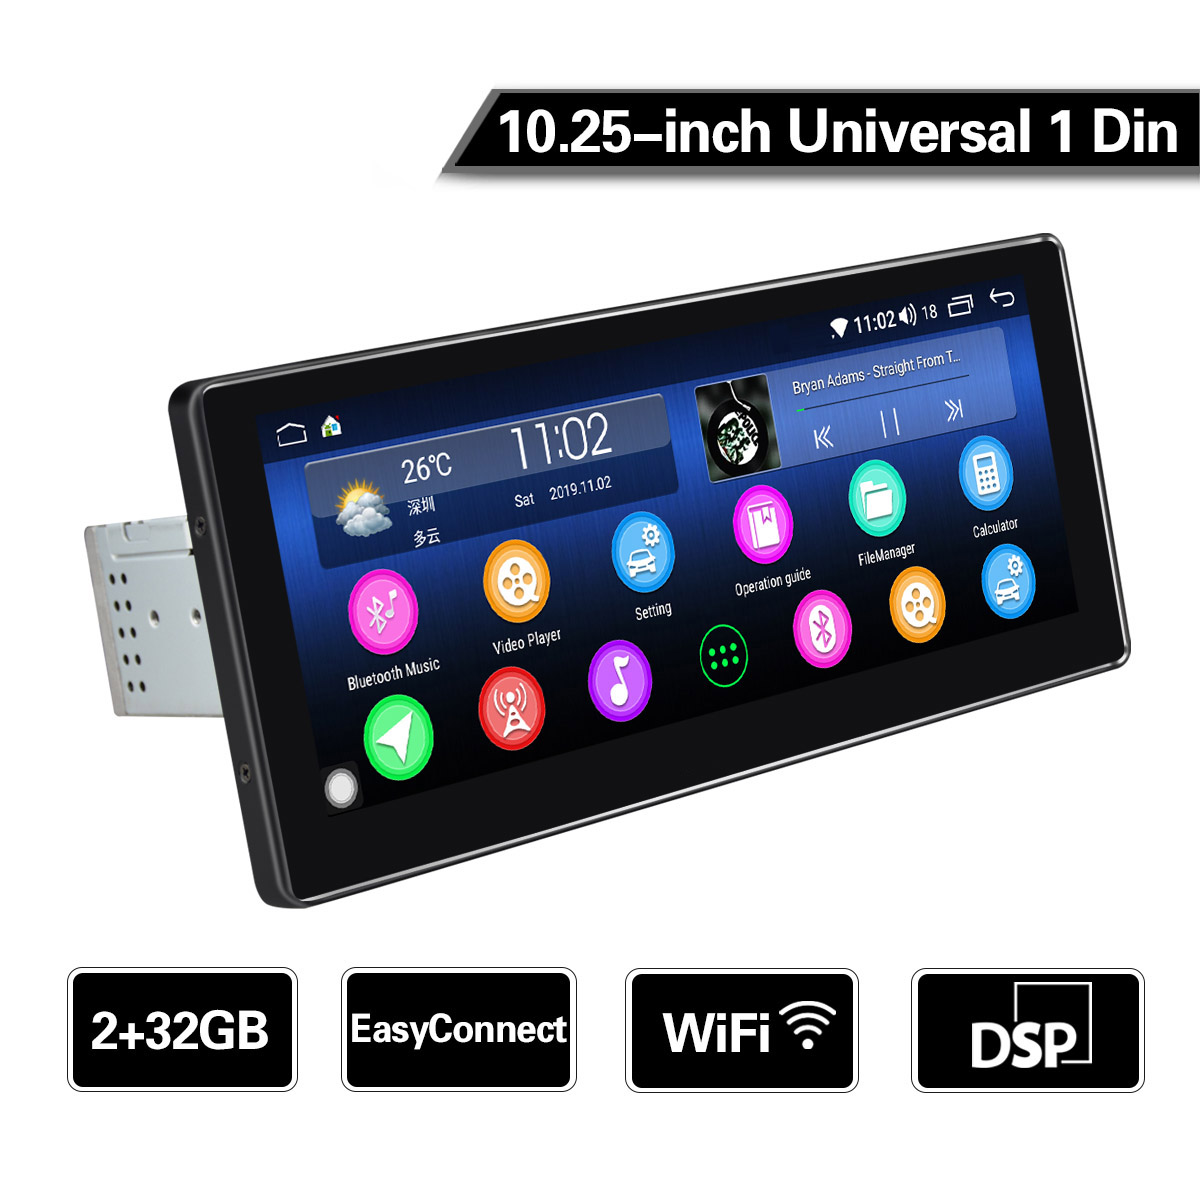 schwarz JOYKK Universal Handy K/ühler K/ühlerhalter L/üfter K/ühler f/ür Smartphone Tablet Zubeh/ör